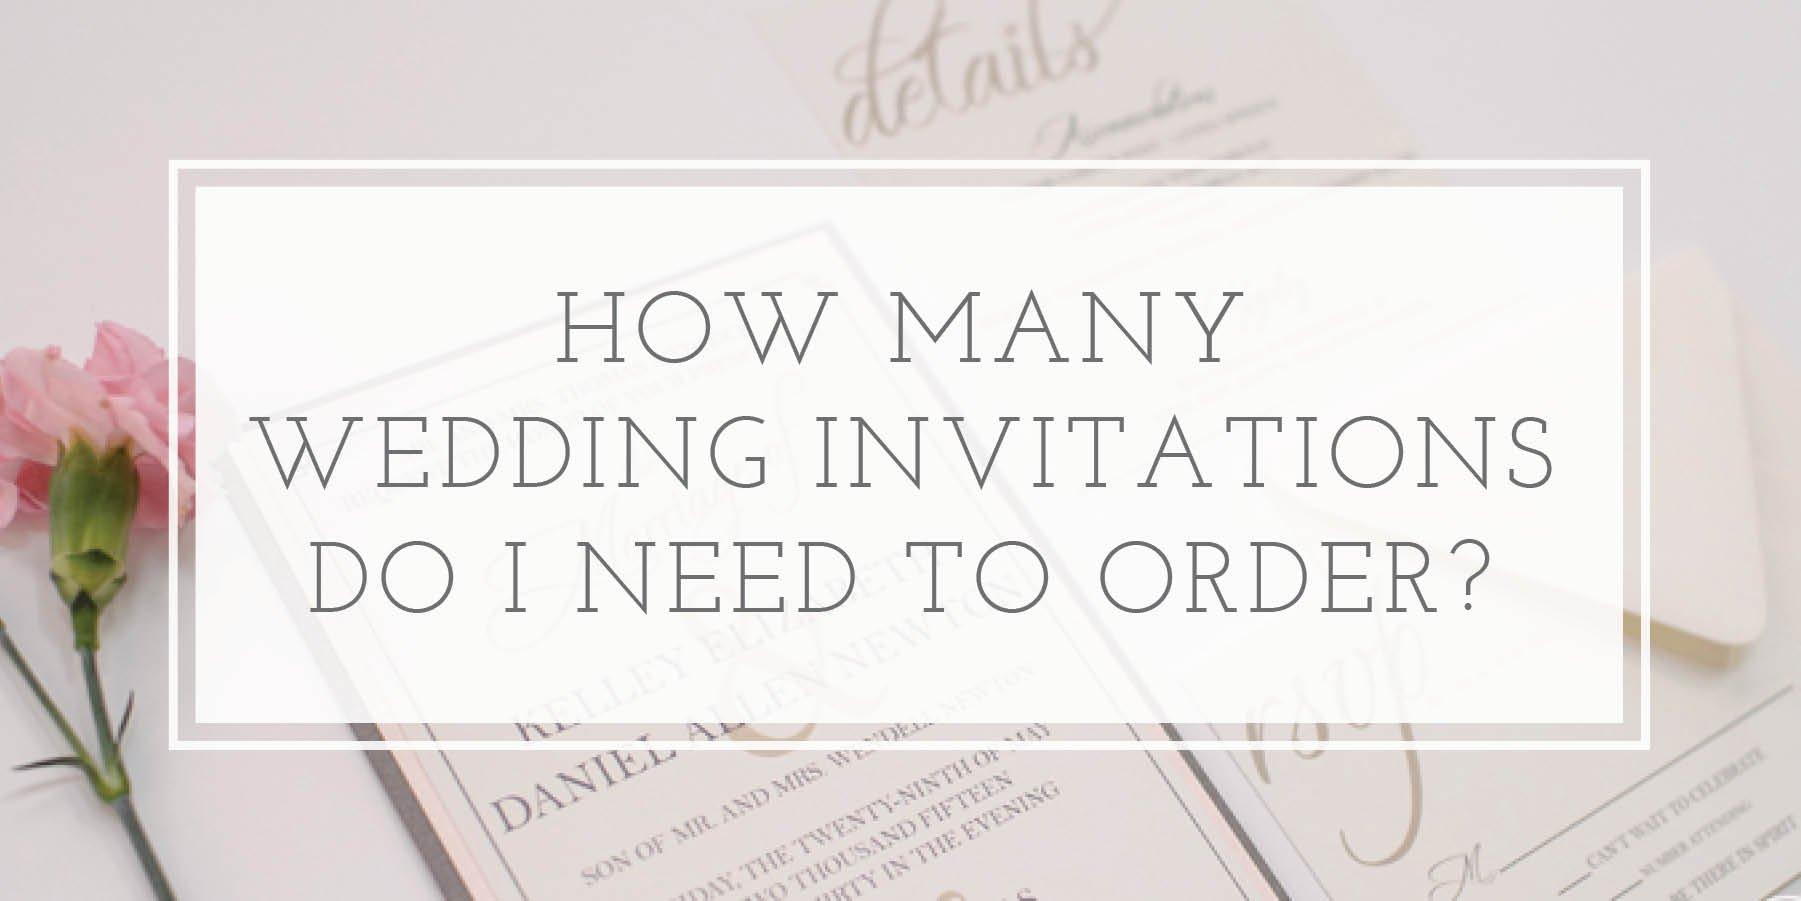 How Many Wedding Invitations Should I Order?